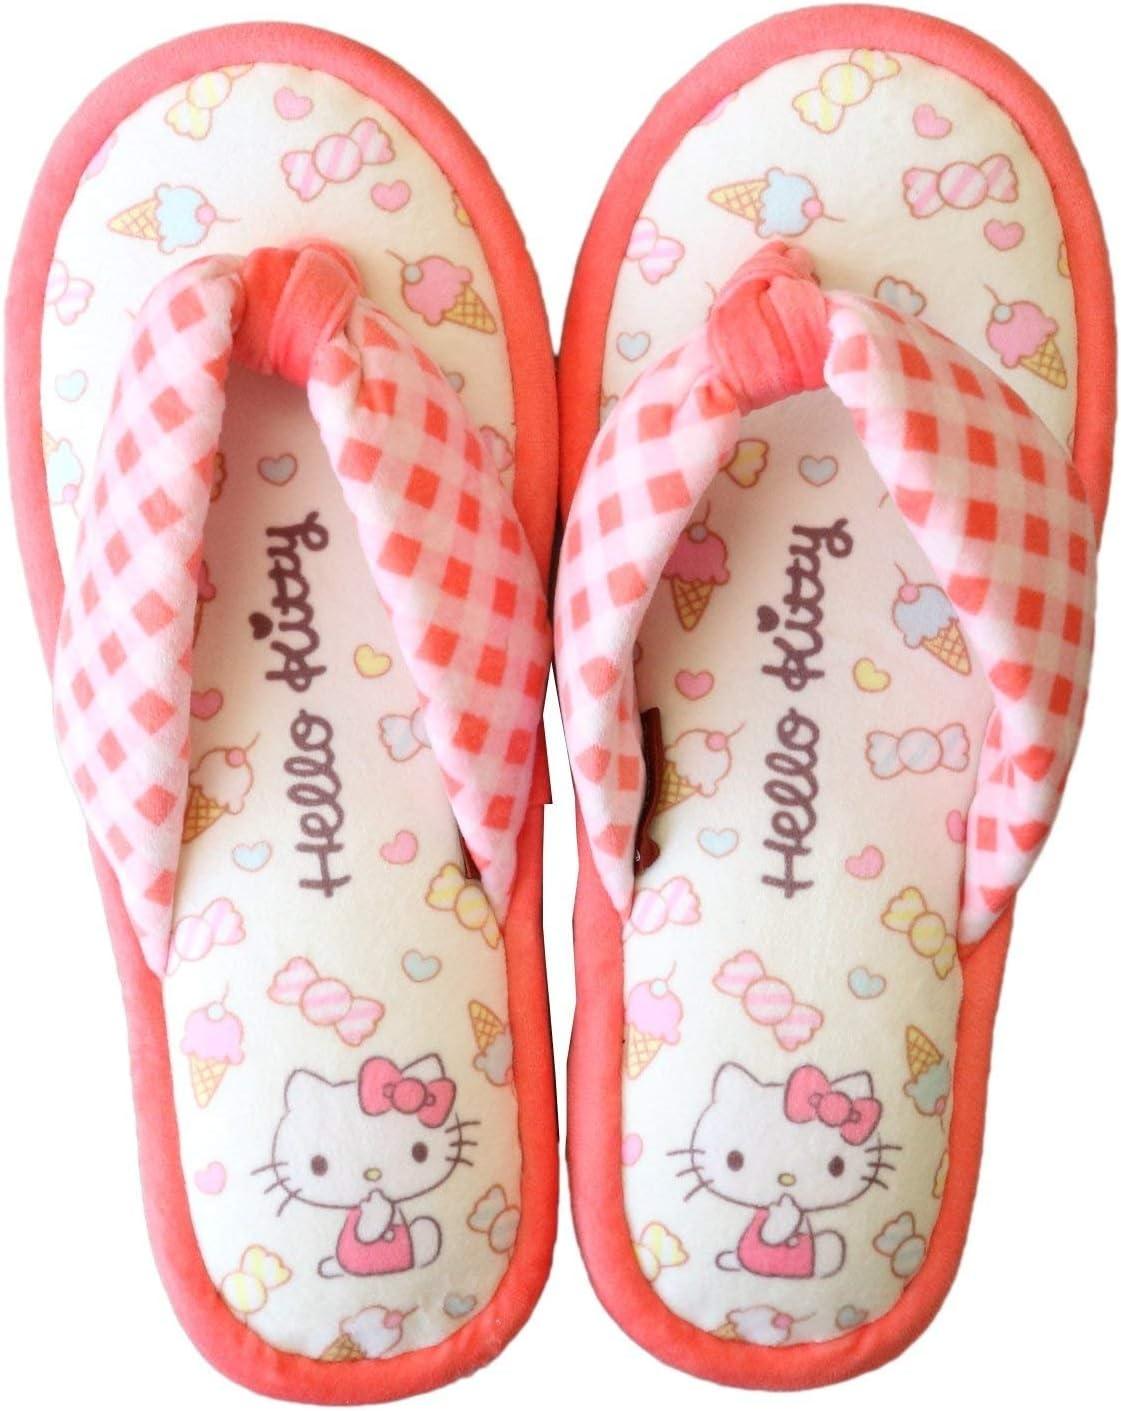 Sanrio Hello Kitty Room Slippers House